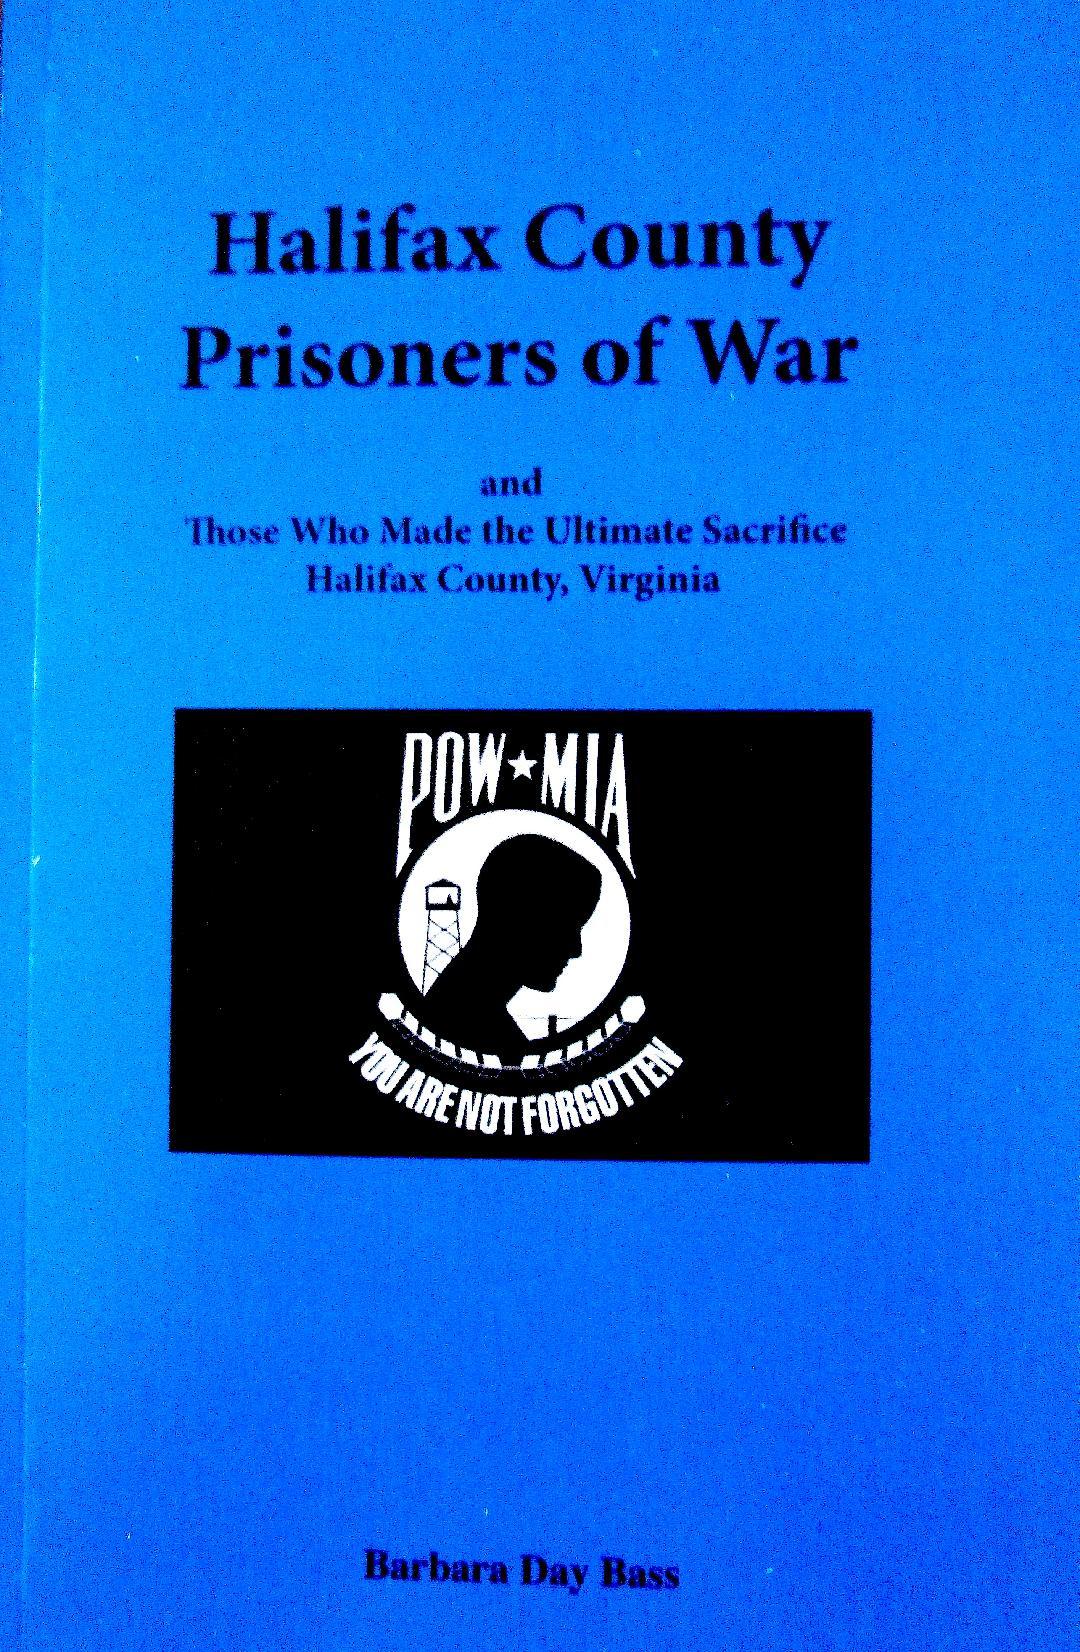 POW book cover.jpg